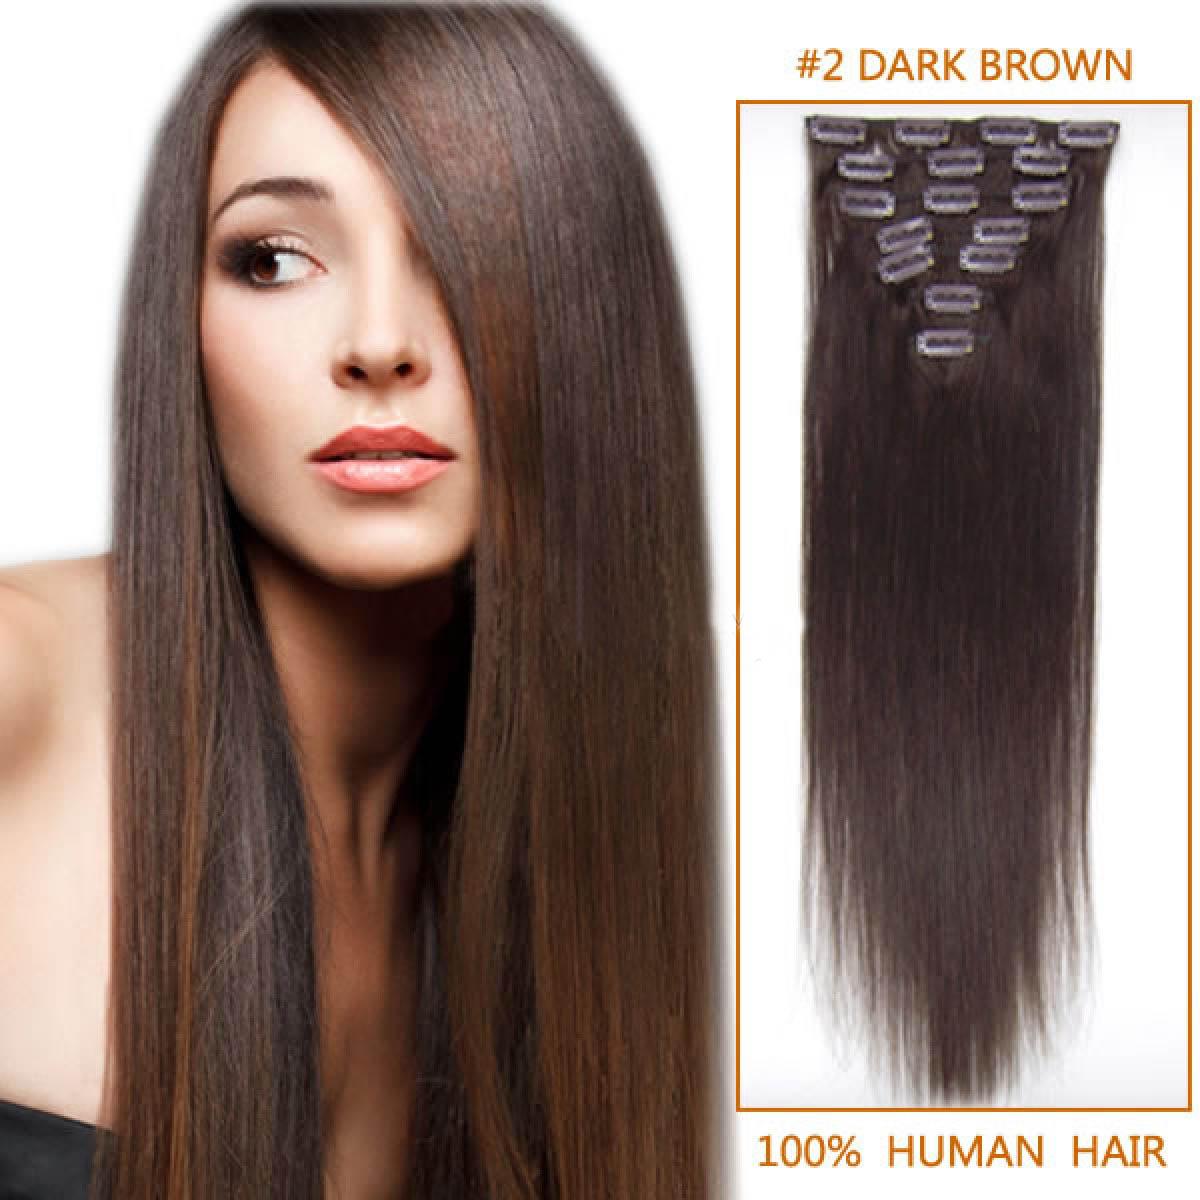 32 Inch #2 Dark Brown Clip In Human Hair Extensions 10pcs